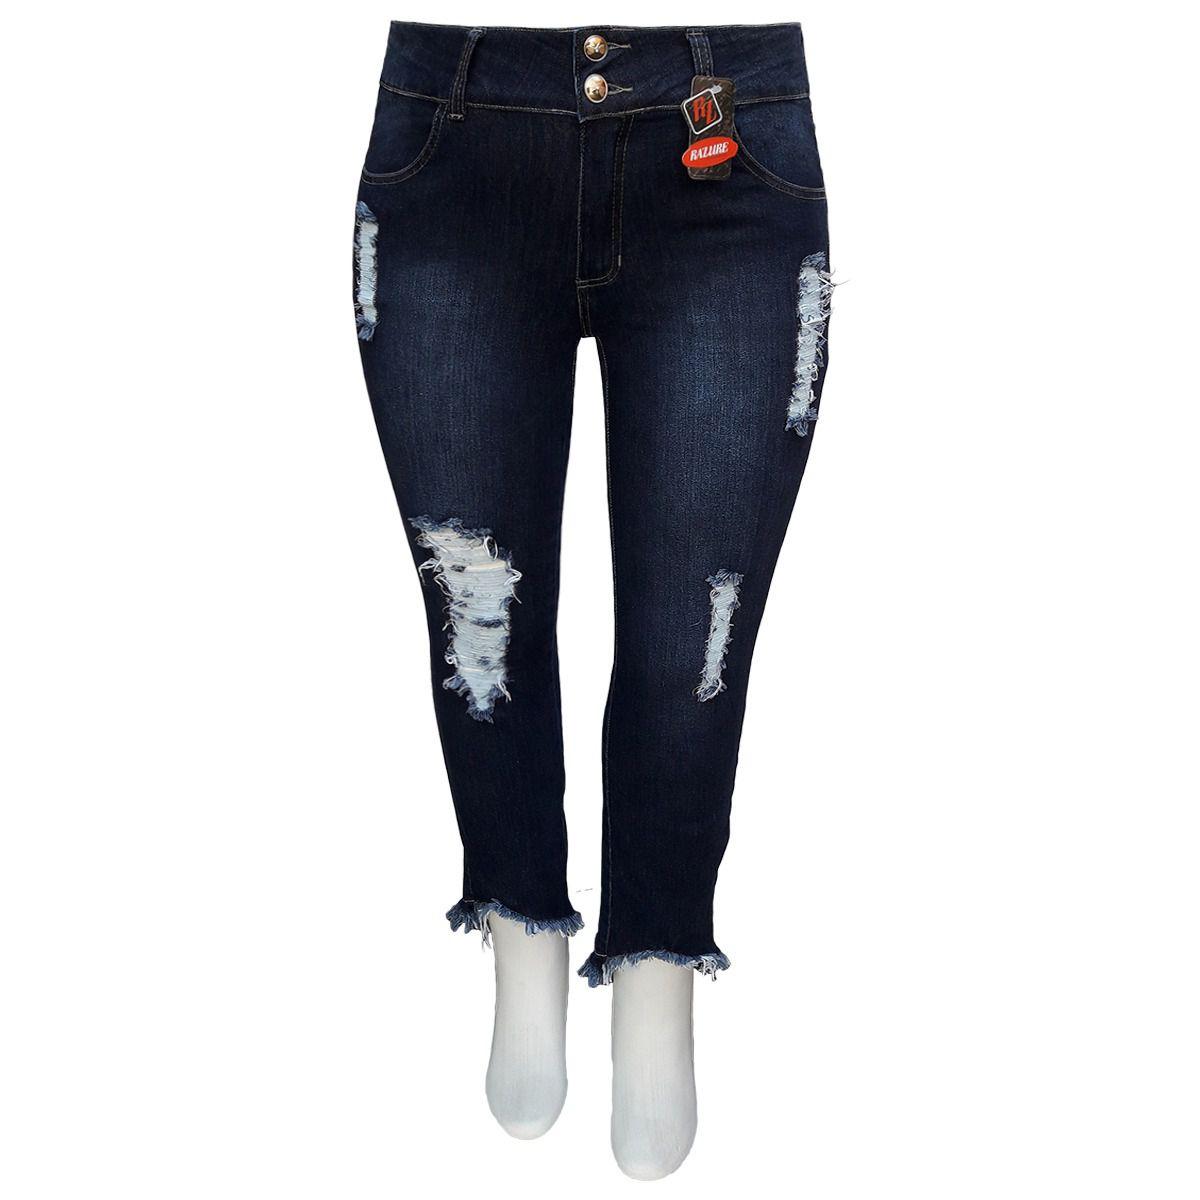 Calça Jeans Fem Cropped Rasgada Barra Desfiada Plus Size